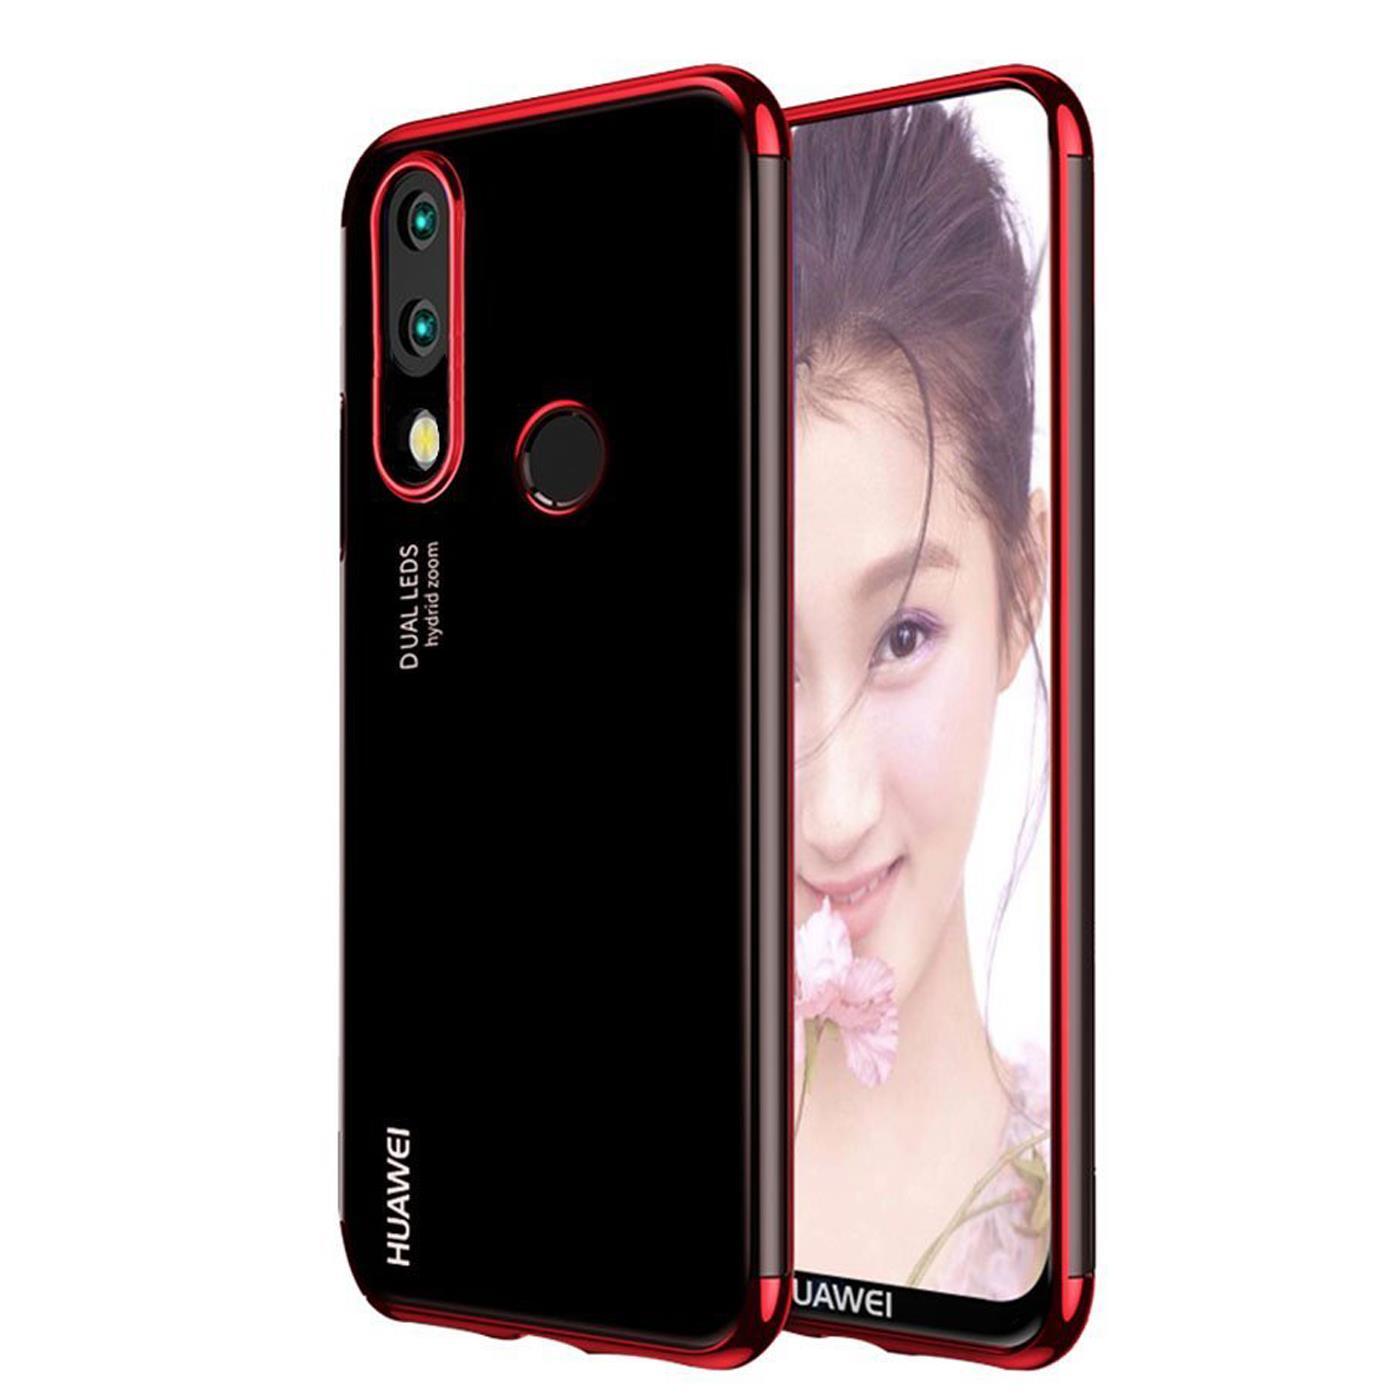 Silikon-Klar-Case-fuer-Huawei-p20-Lite-Ultra-Slim-Stossfeste-Gel-Rueckseite Indexbild 12